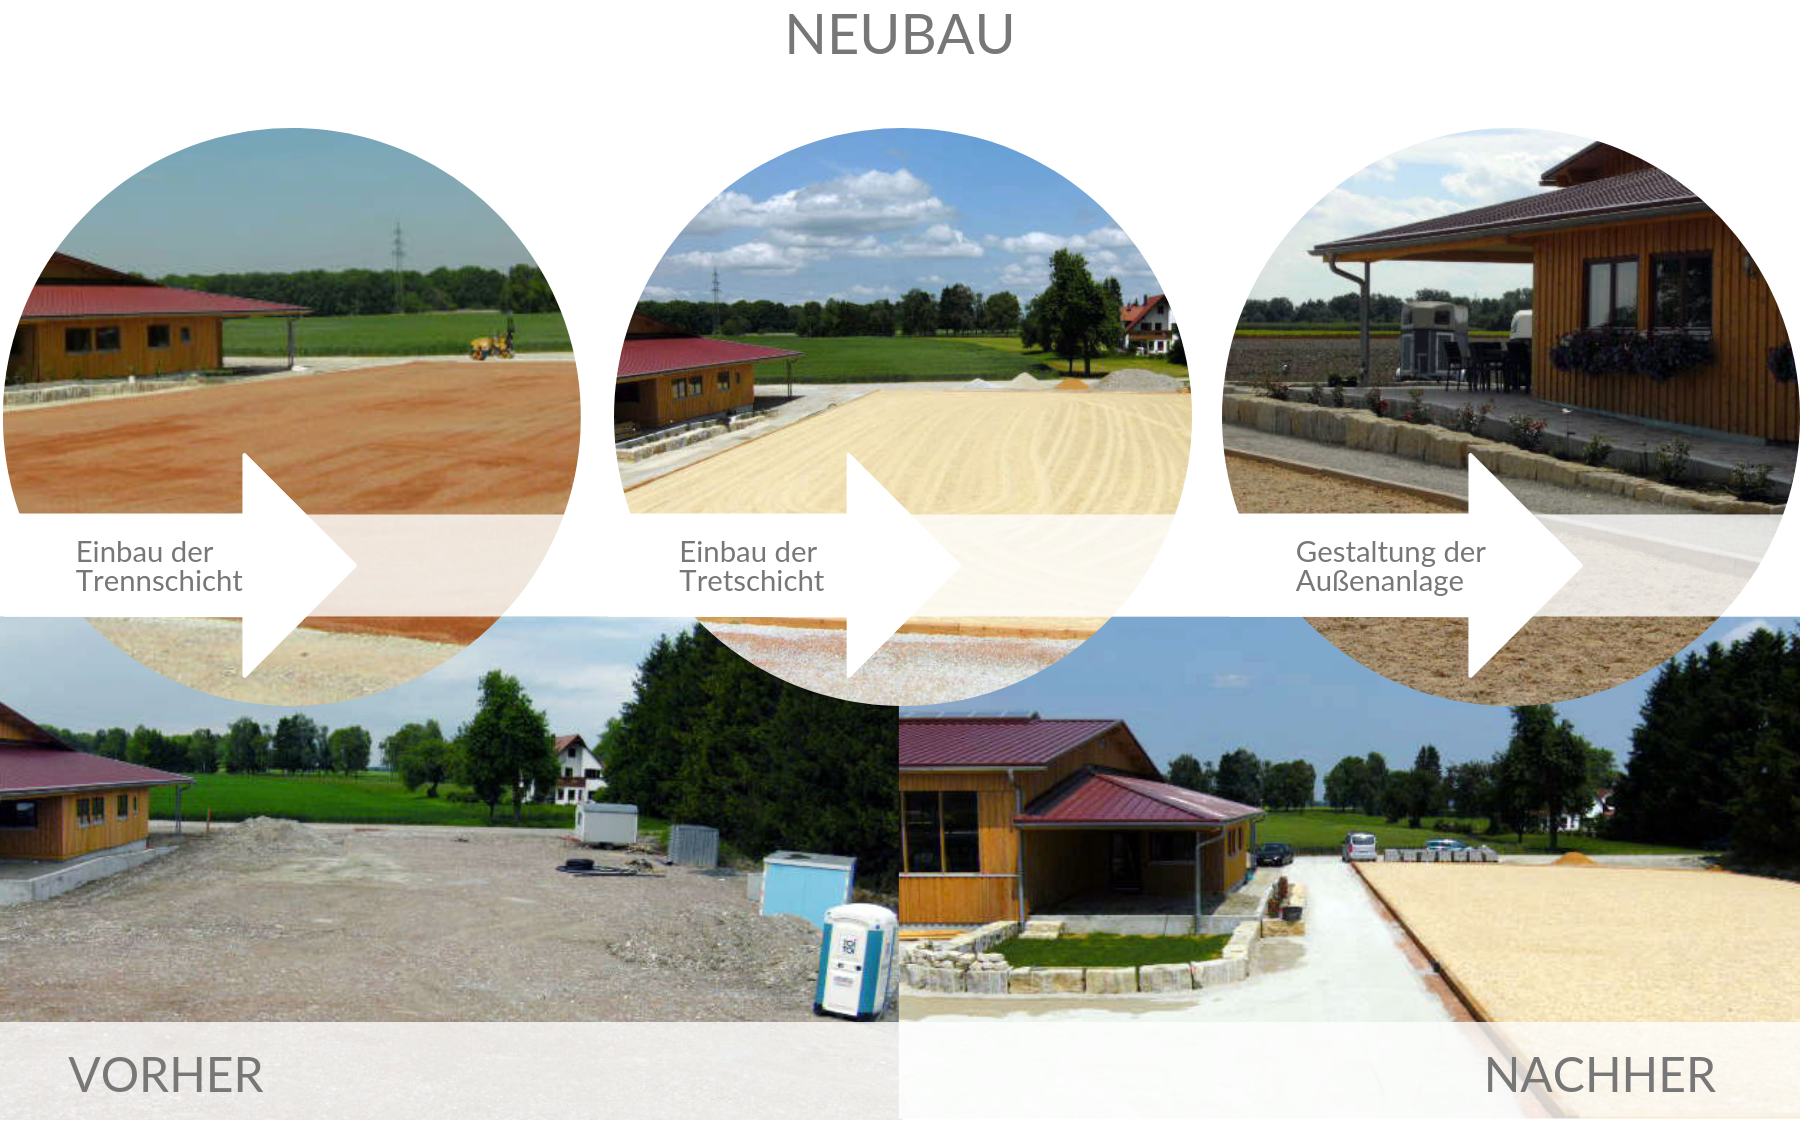 neubau (3)